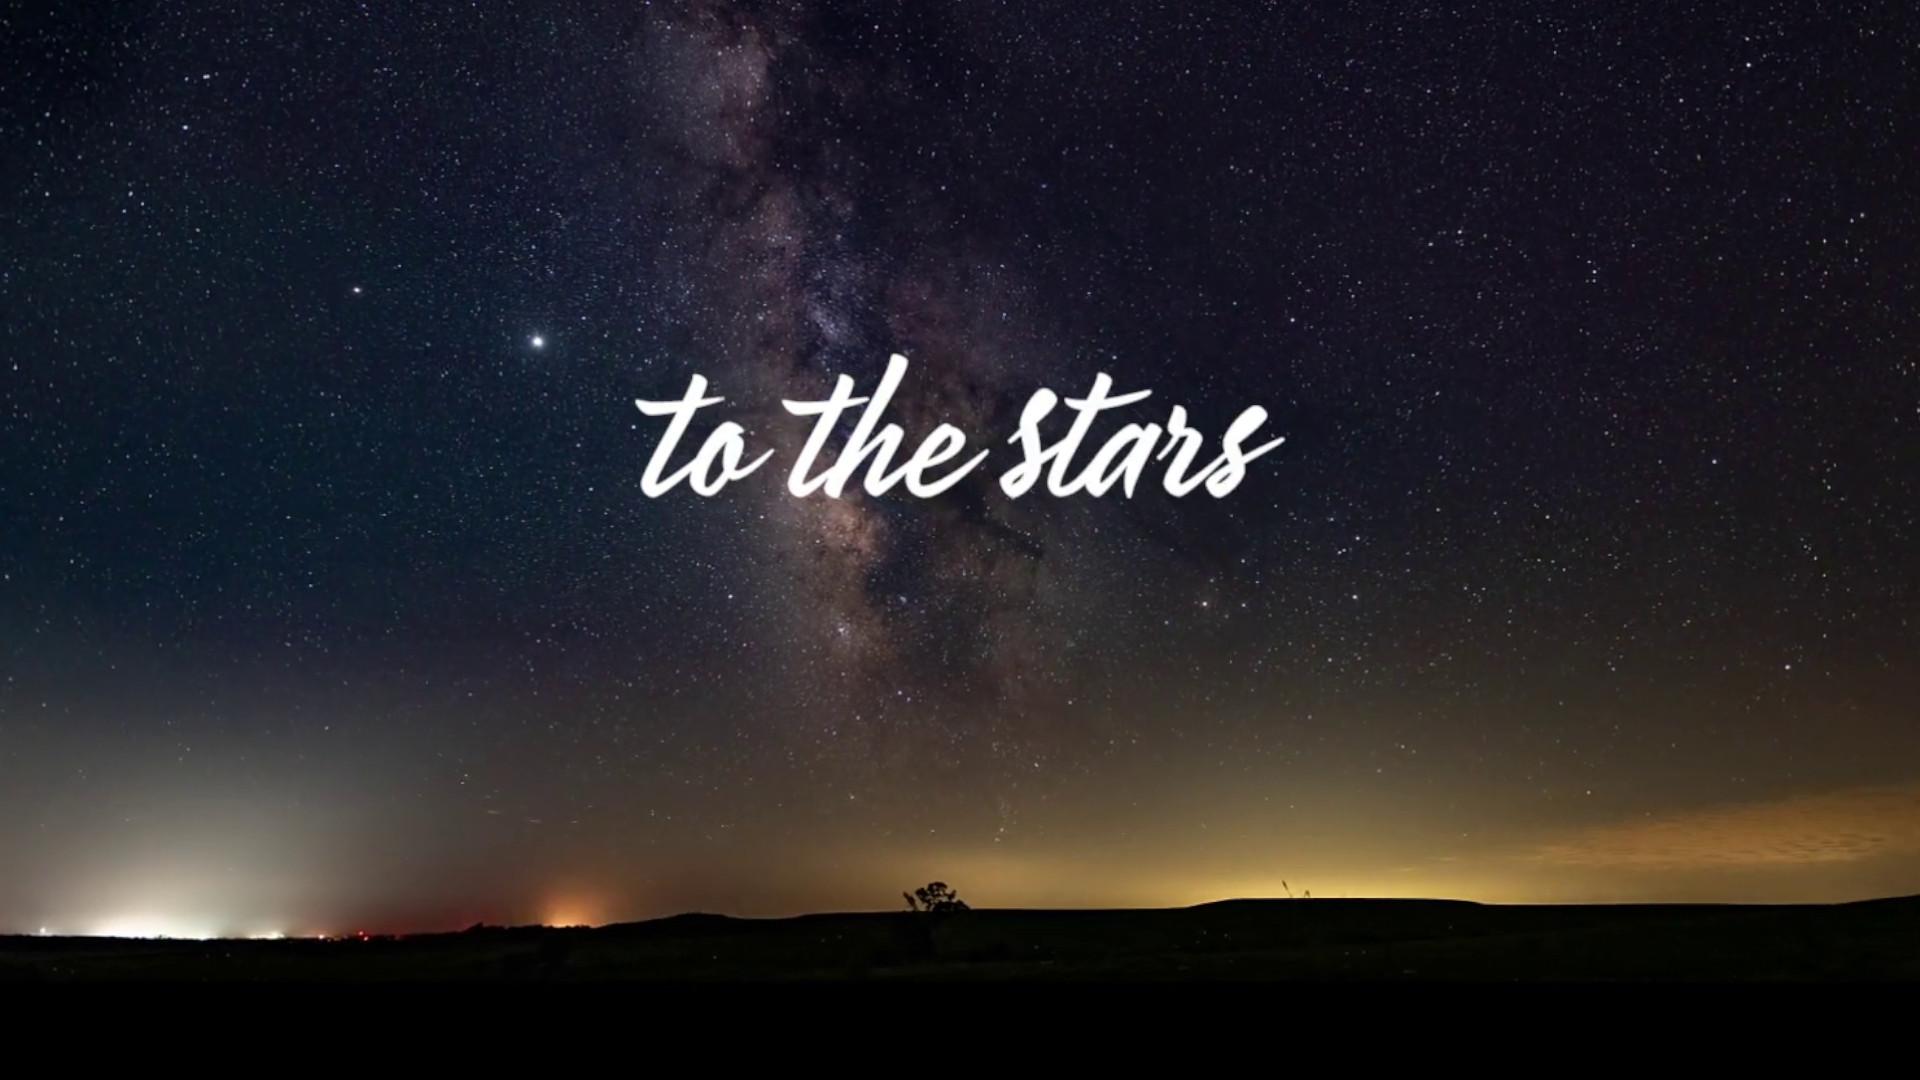 To The Stars Social Media Campaign of Kansas